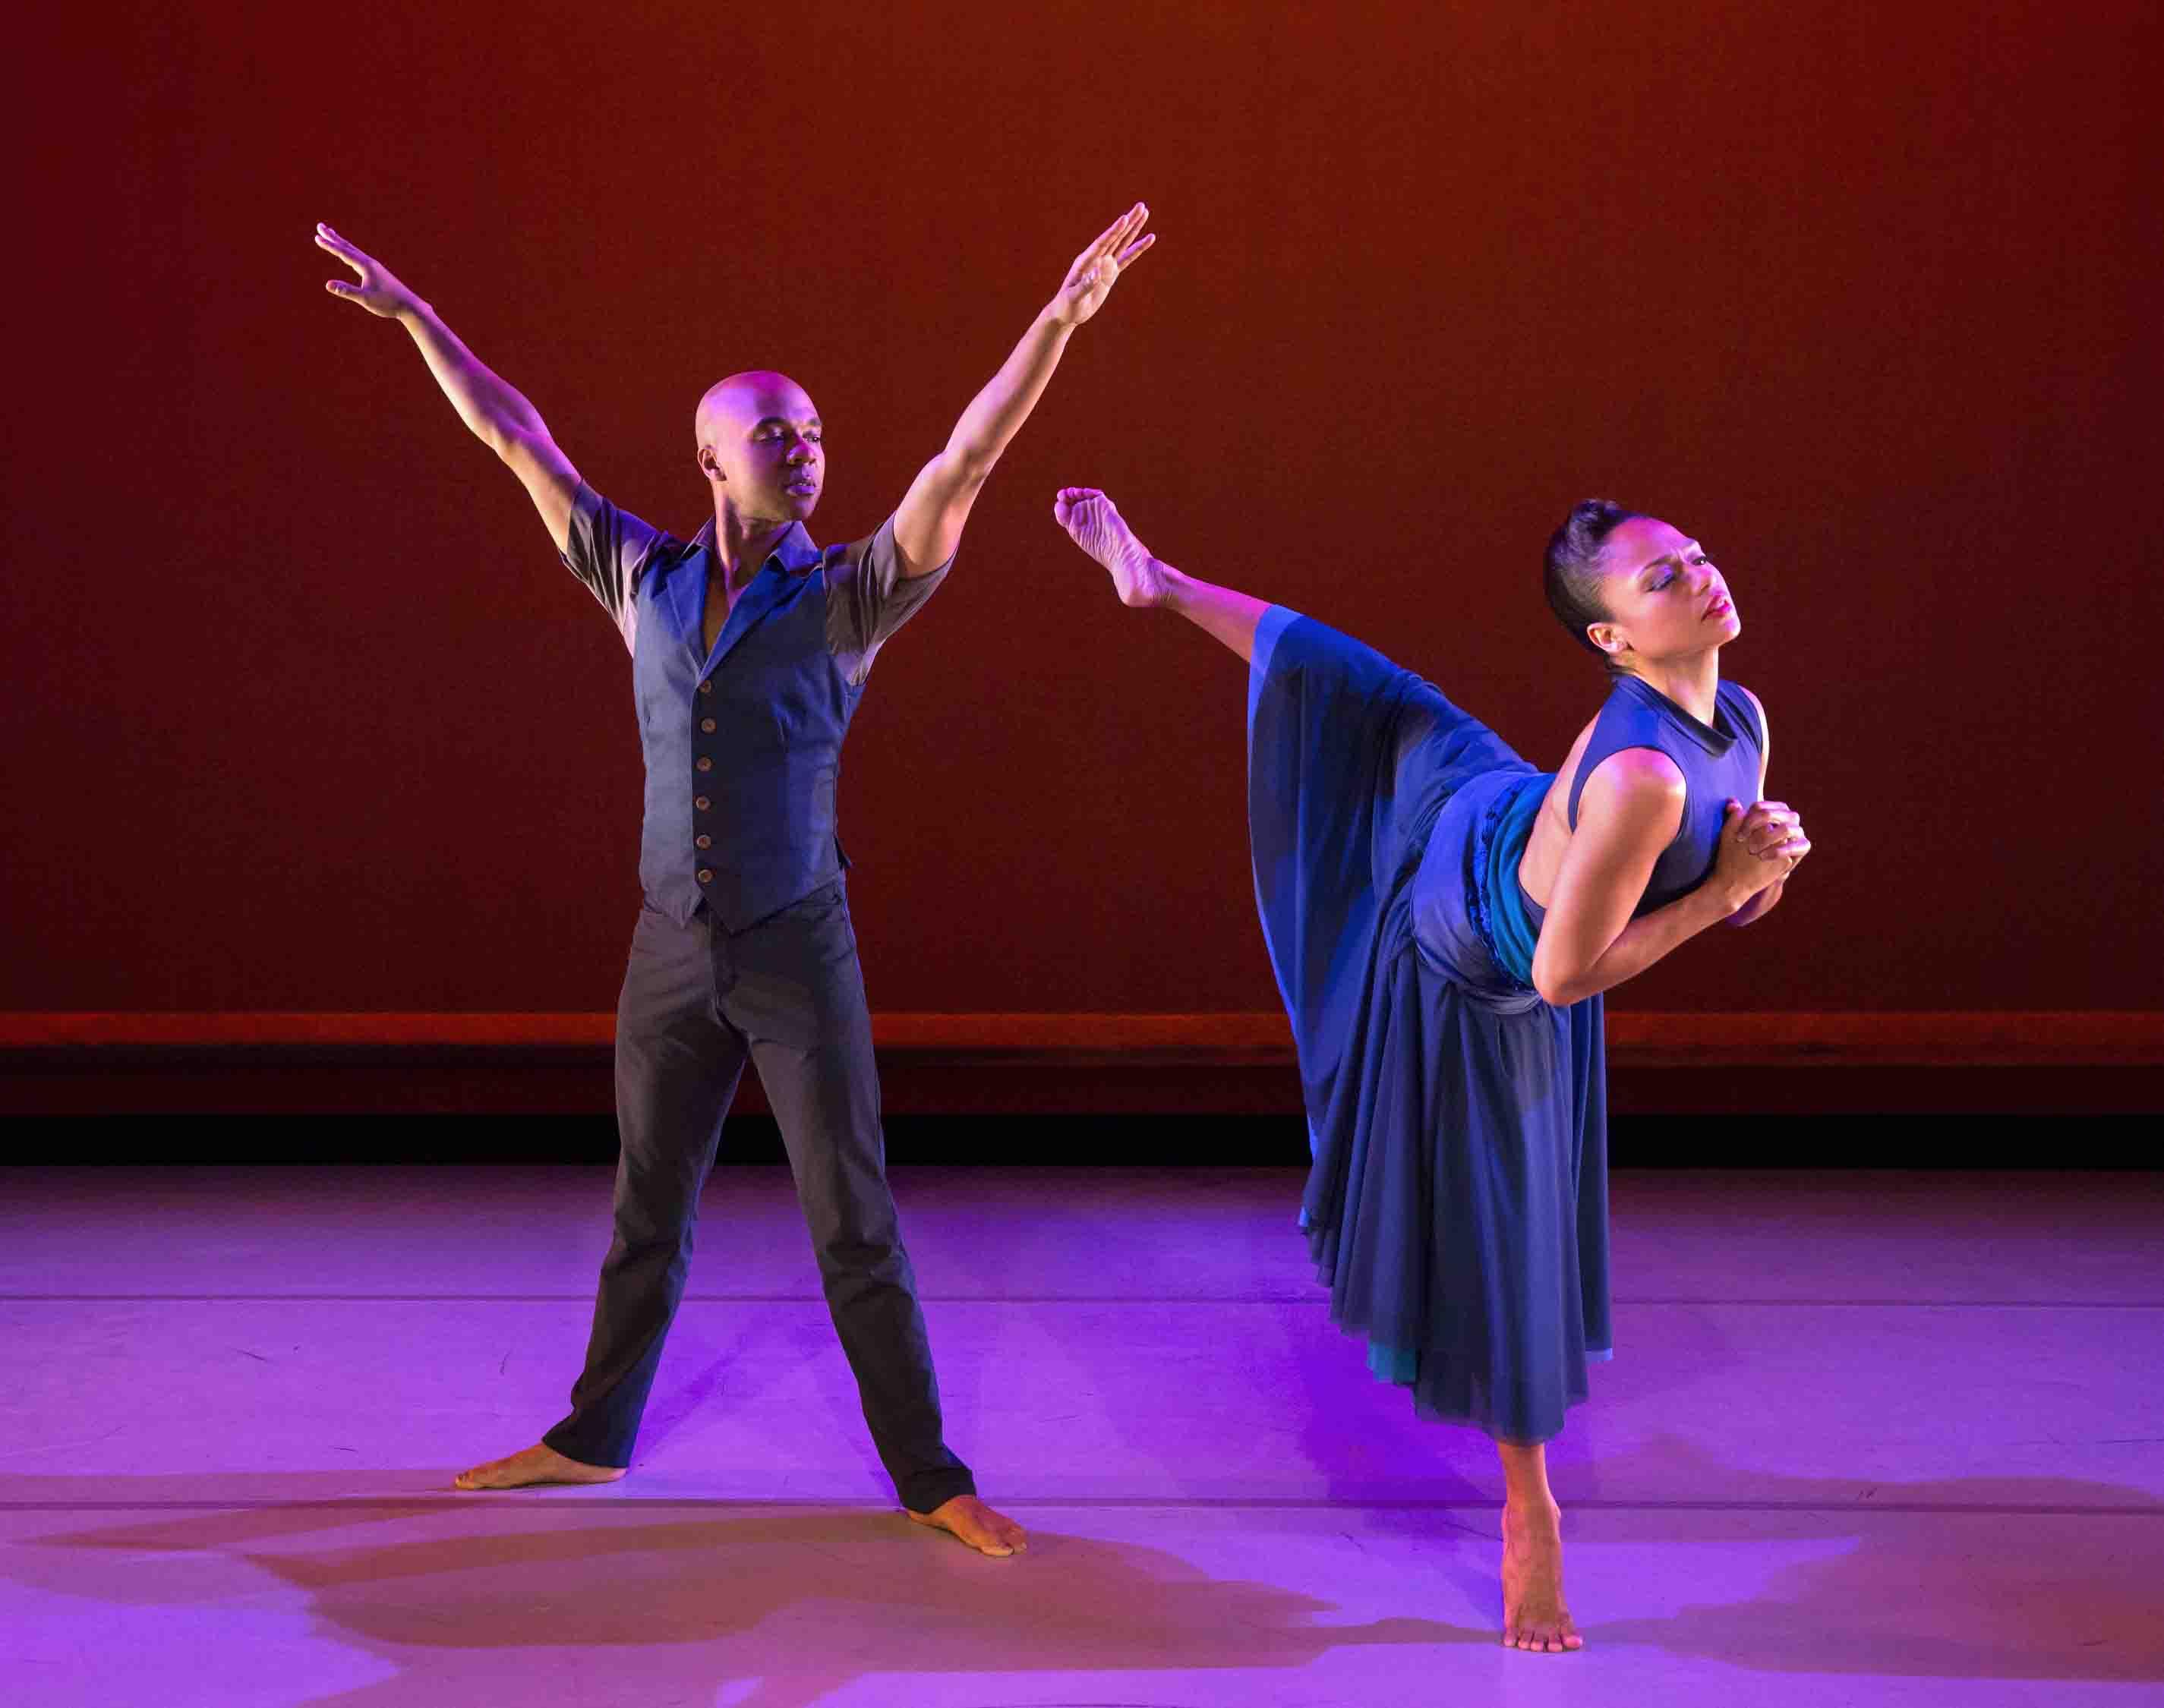 Alvin Ailey American Dance Theater Globe Dancer